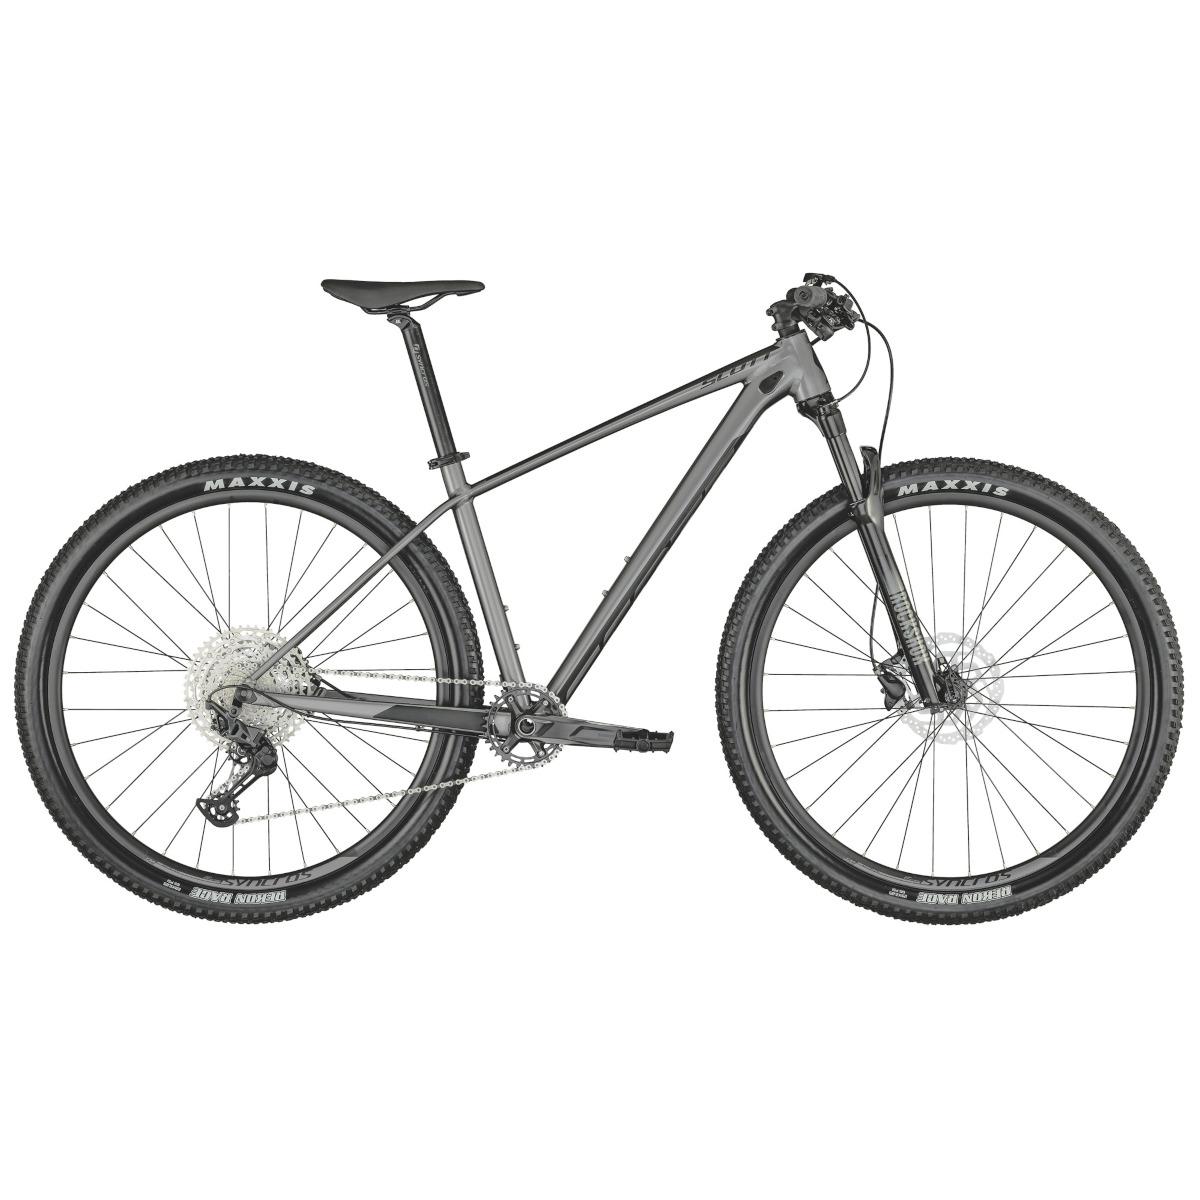 SCOTT SCALE 965 - Mountainbike - 2022 - gloss slate grey / matte dark grey